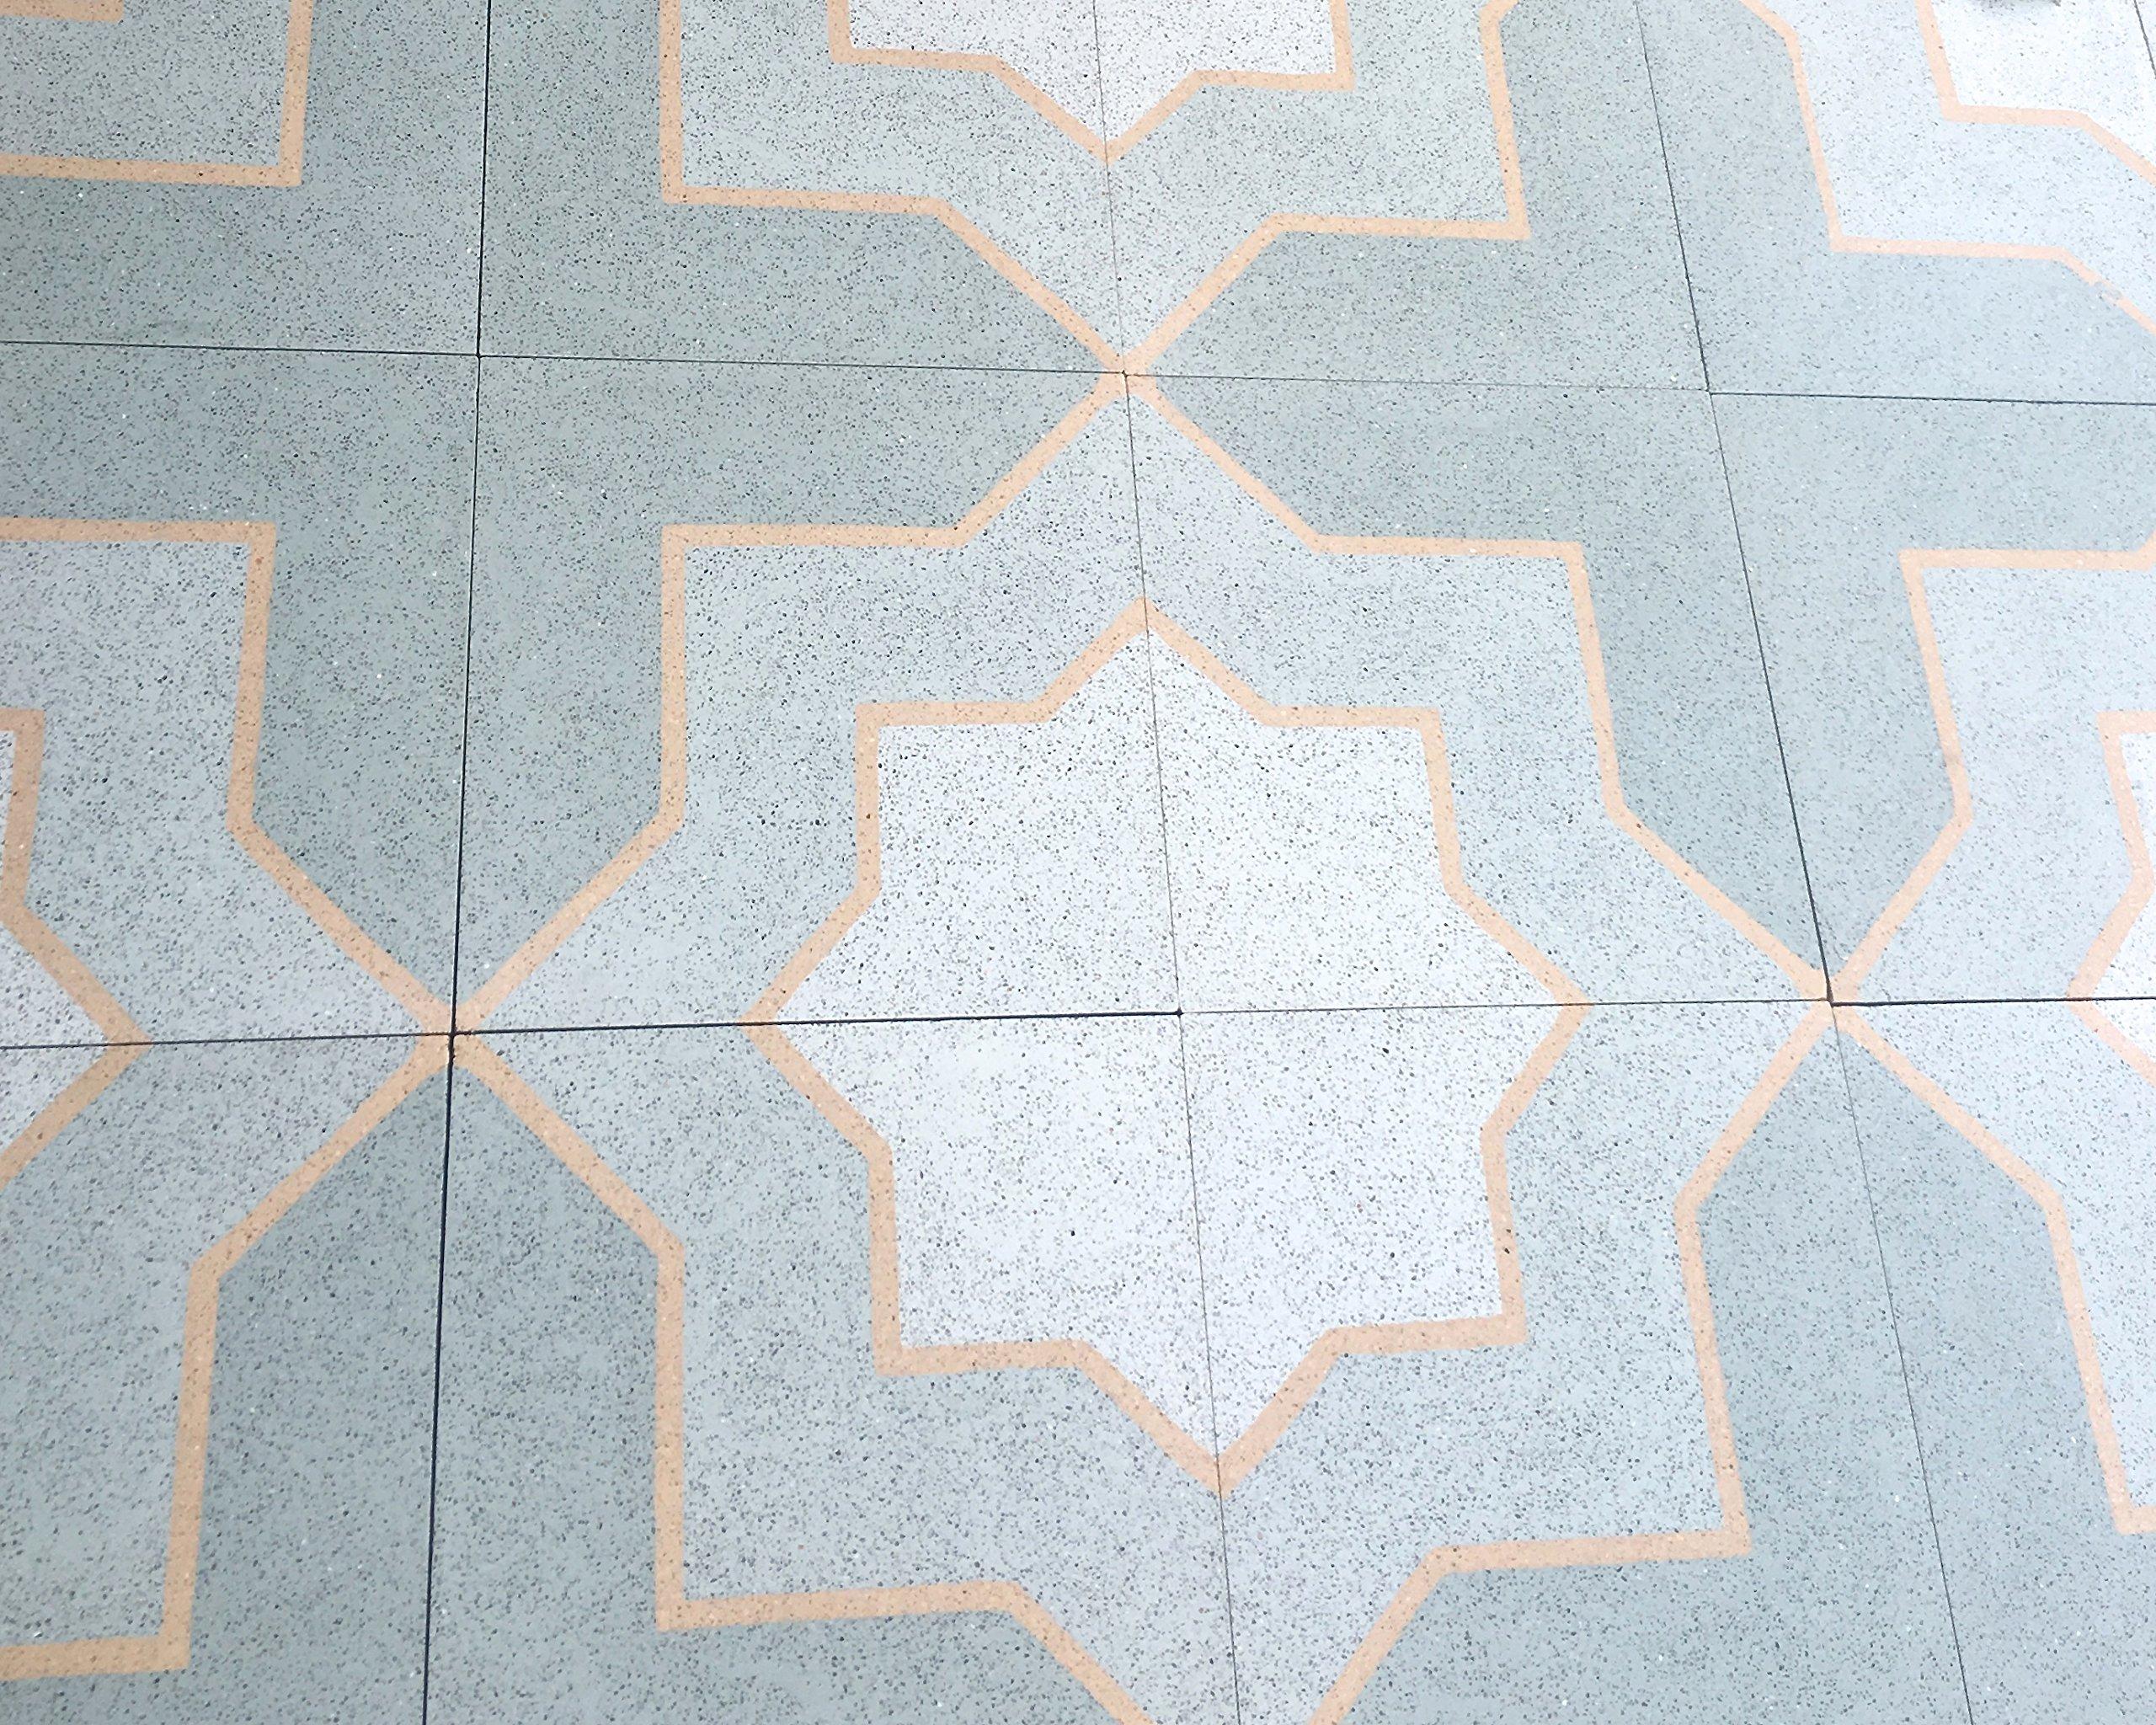 Squarefeet Depot Crossroads Encaustic Blue 8x8 Honed Finish Cement Tile Floor